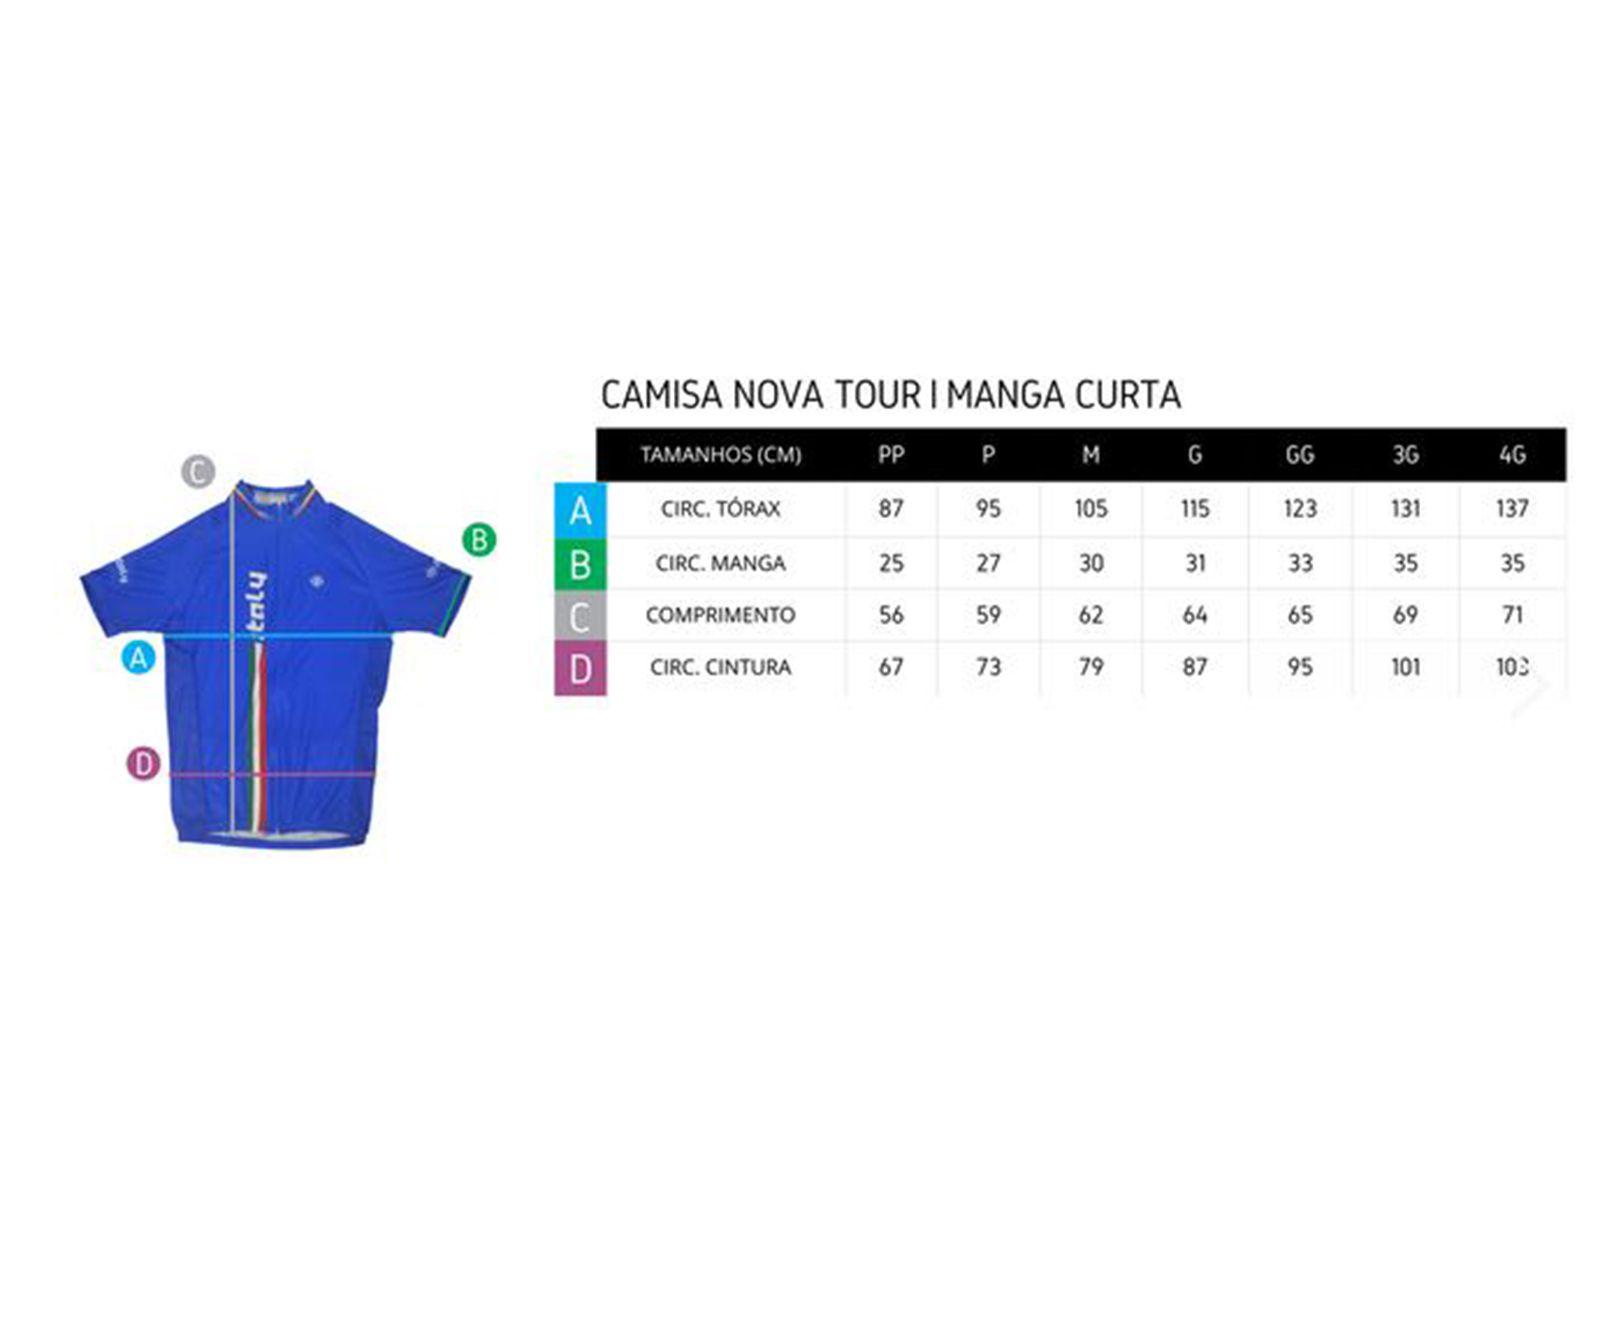 Camisa Ciclismo Valentino Rossi - ERT